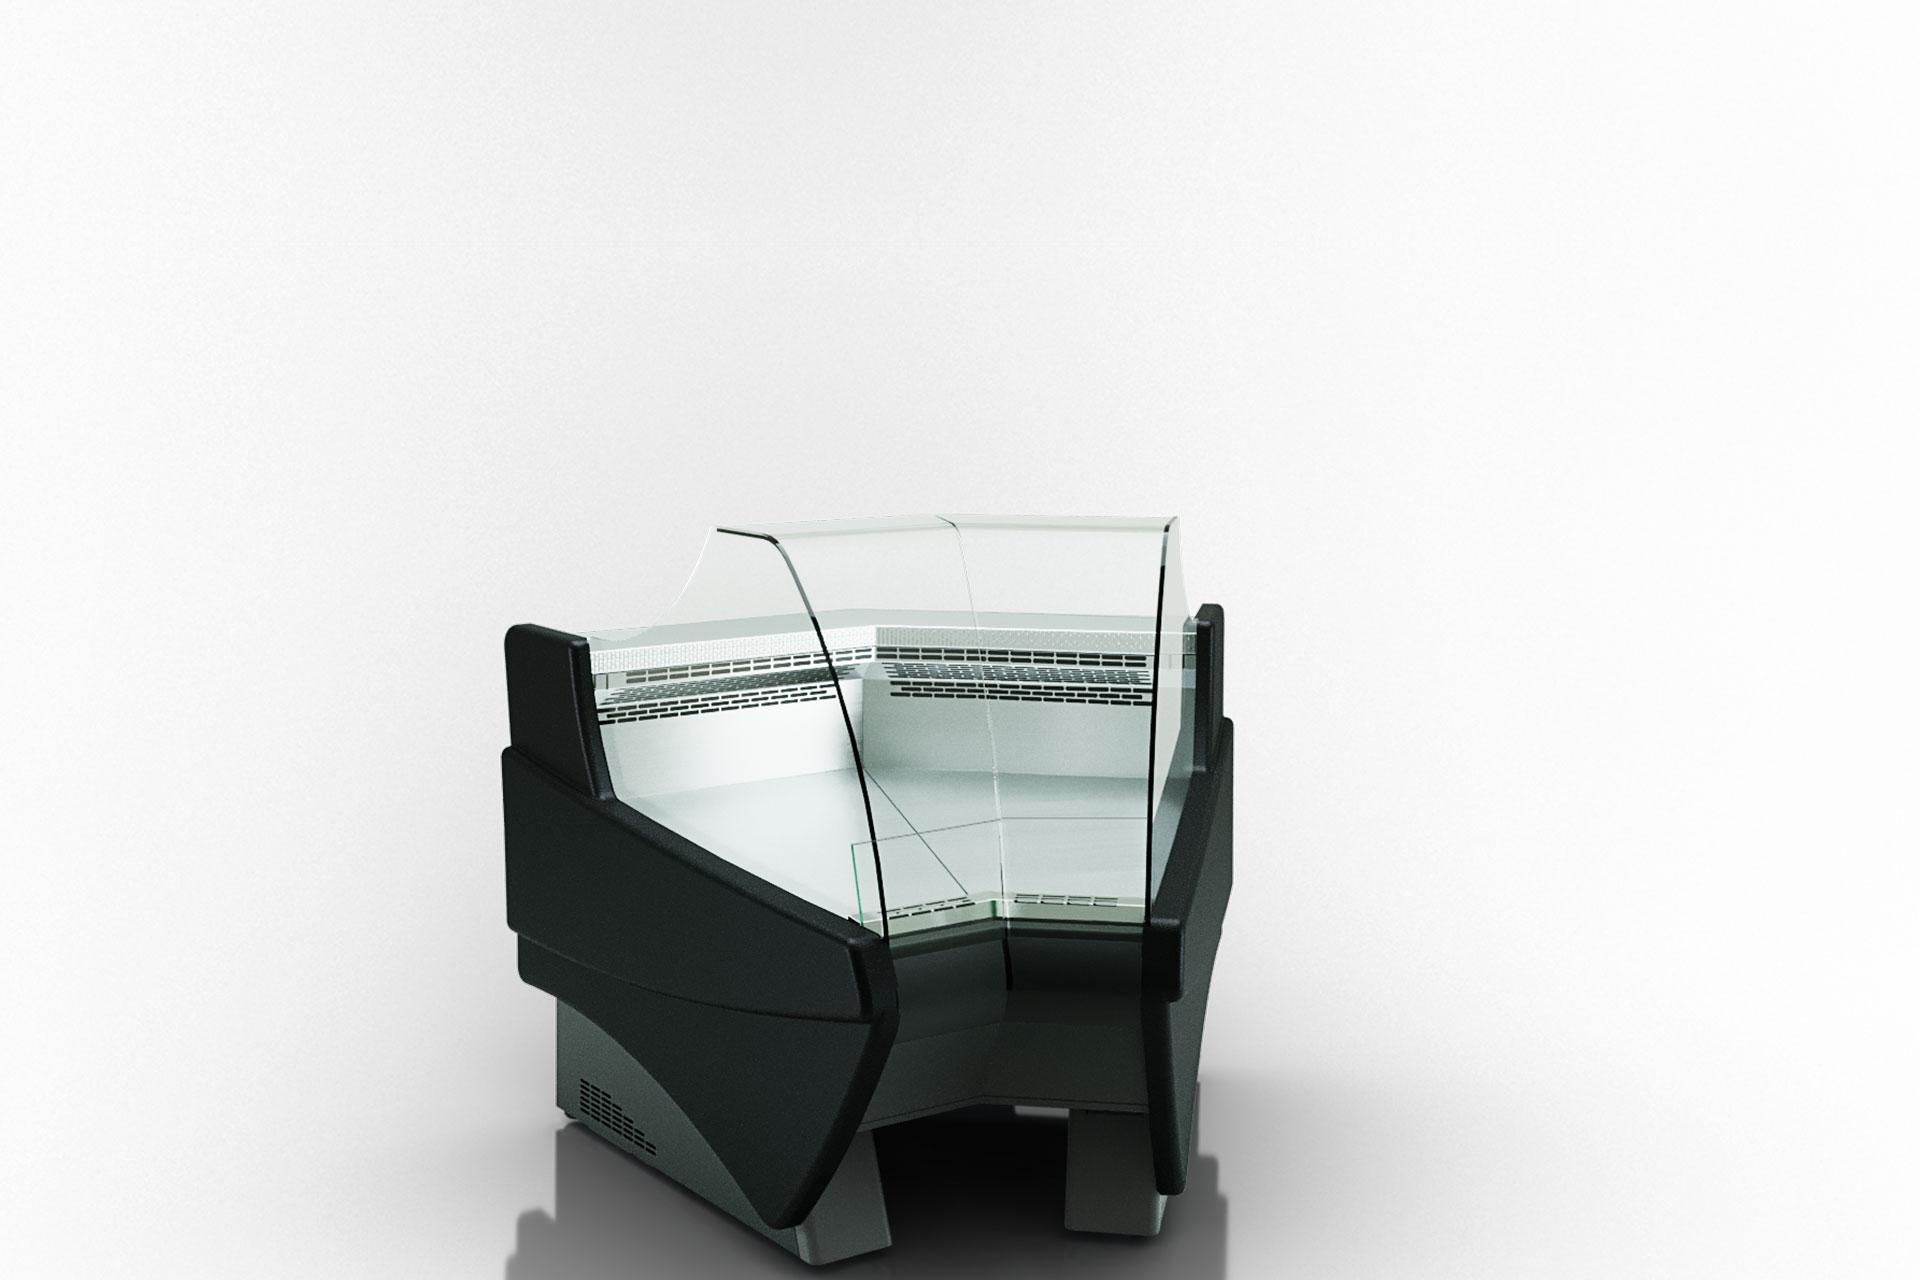 Вітрина Symphony luxe MG 120 deli T 110-DLM-IS45